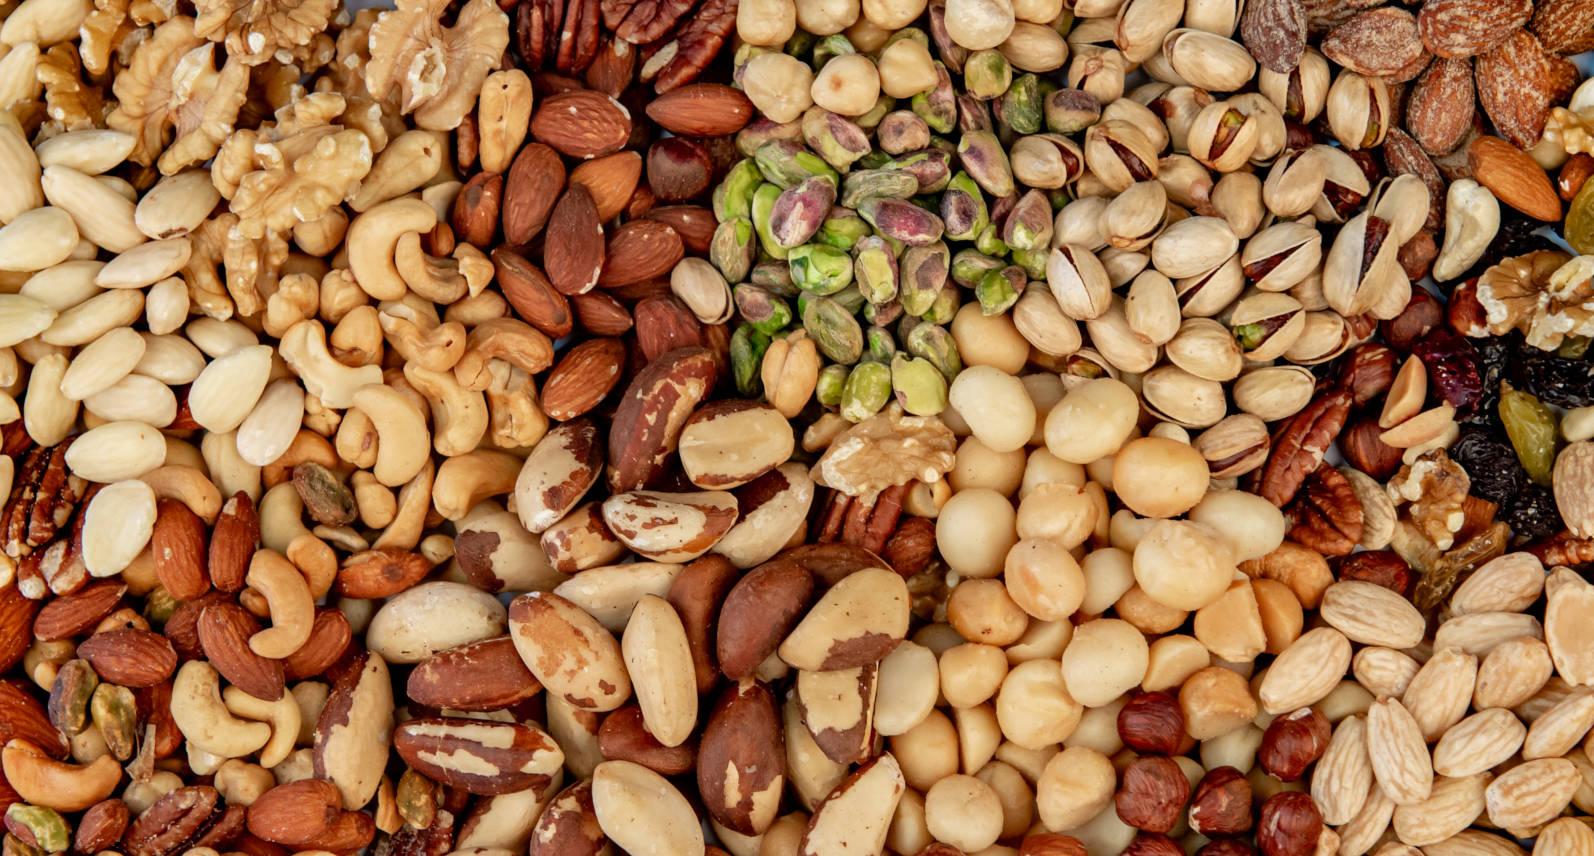 Let's get nuts!